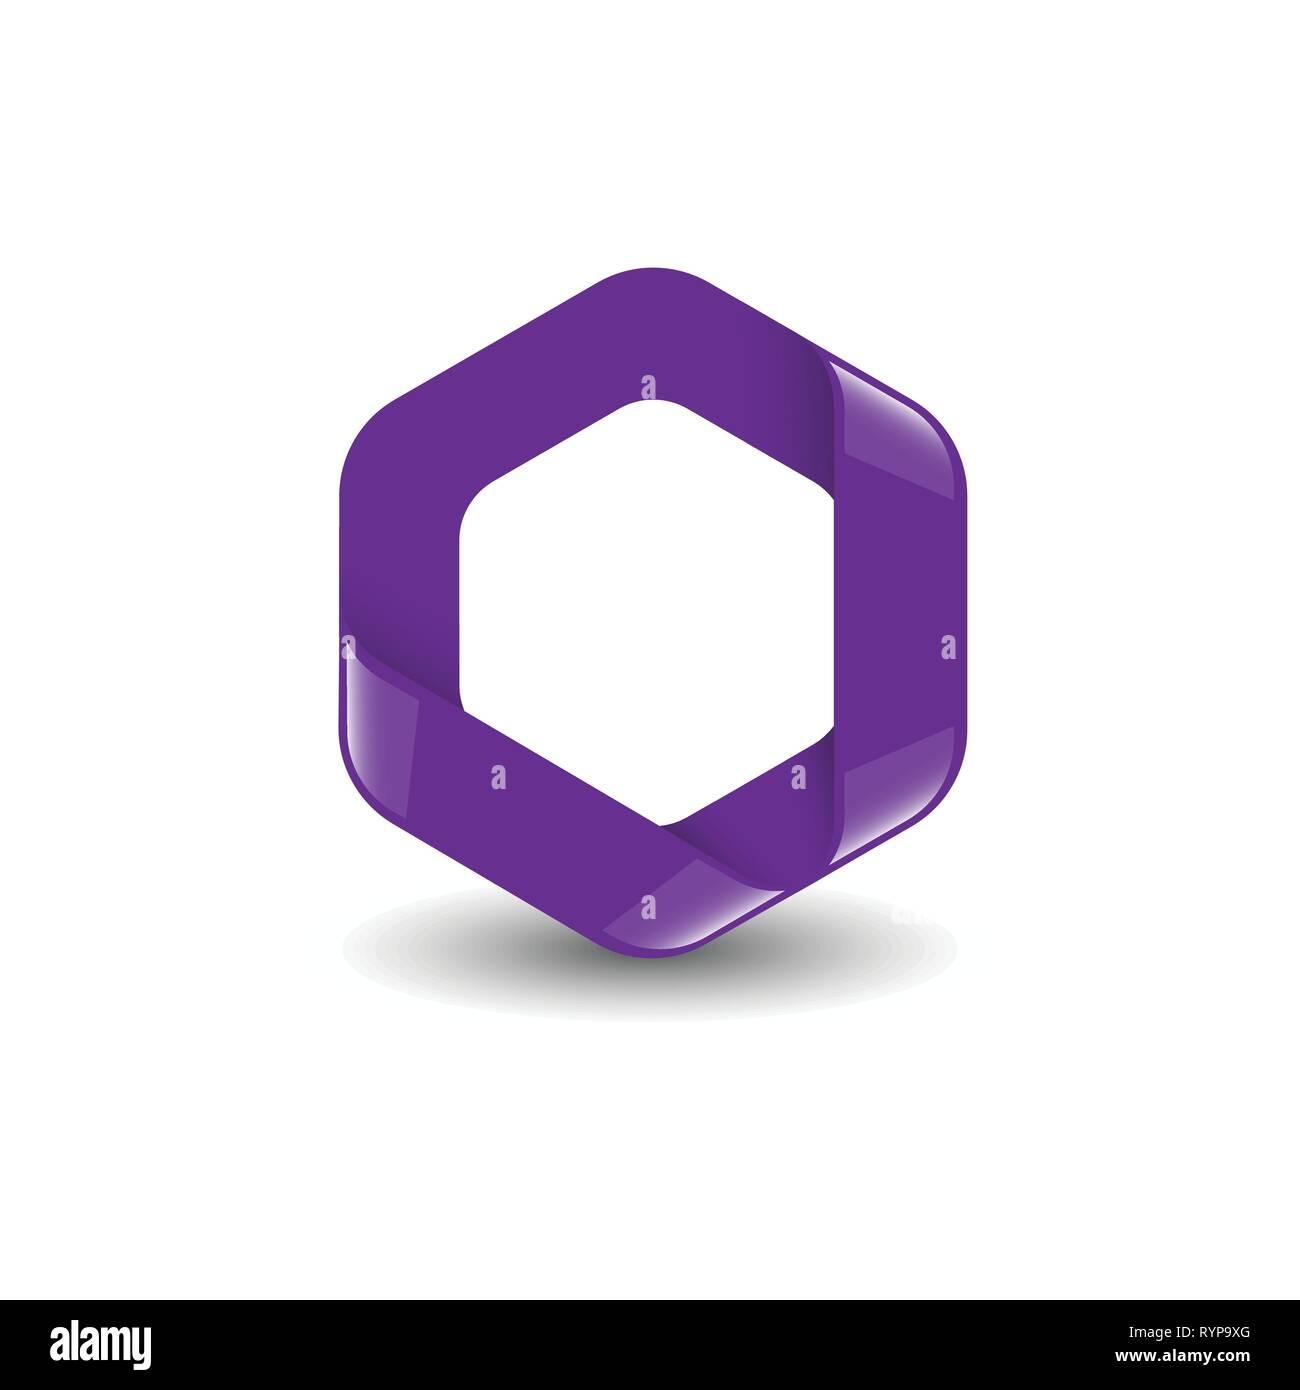 Hexagon - Branding purple color hexagon vector logo concept illustration. Design element. - Stock Image